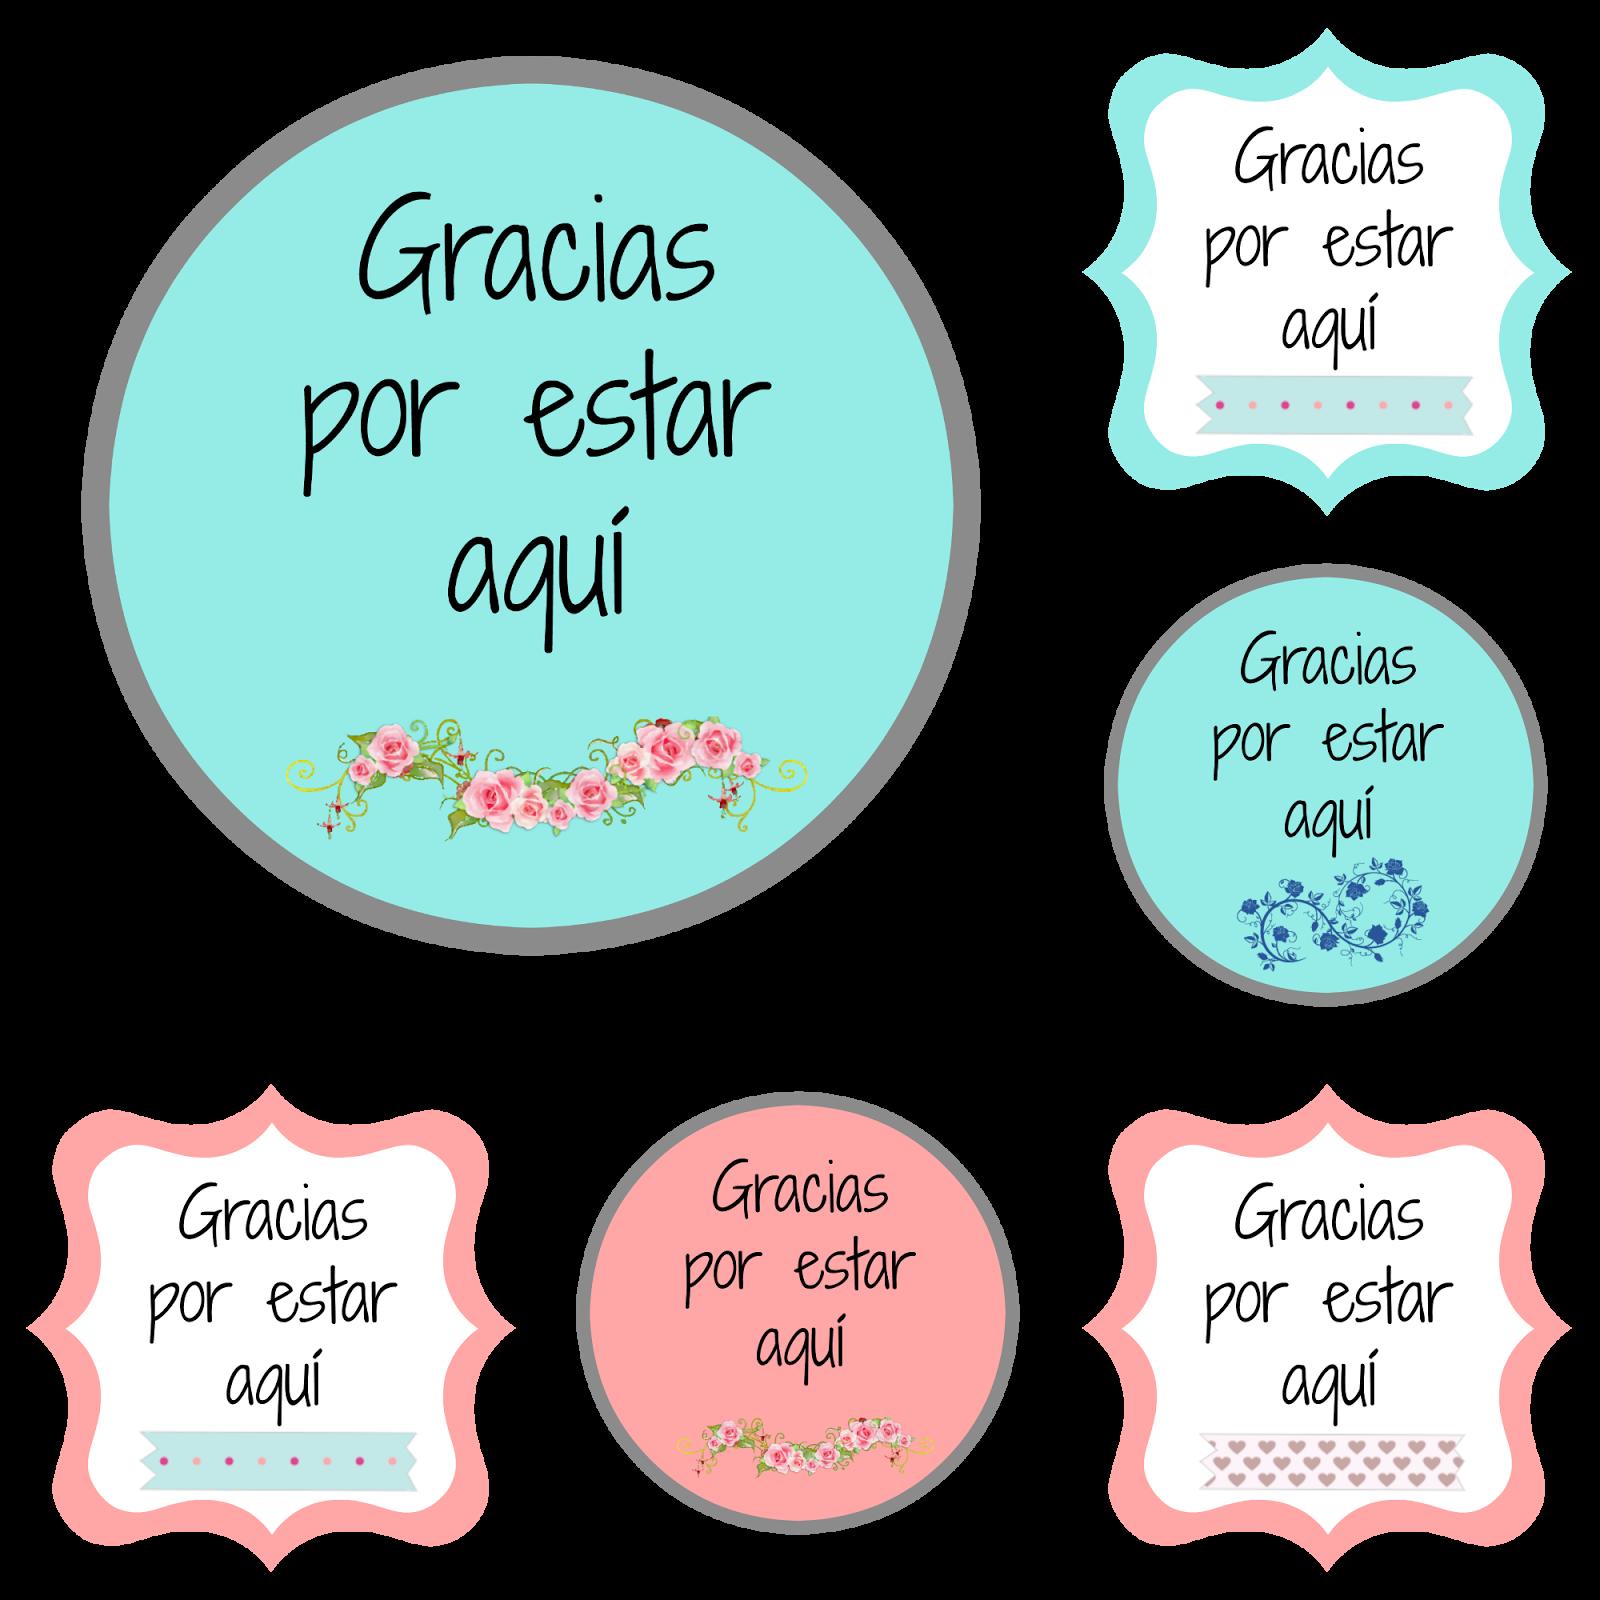 Etiquetas de agradecimiento | Manualidades de boda | Pinterest